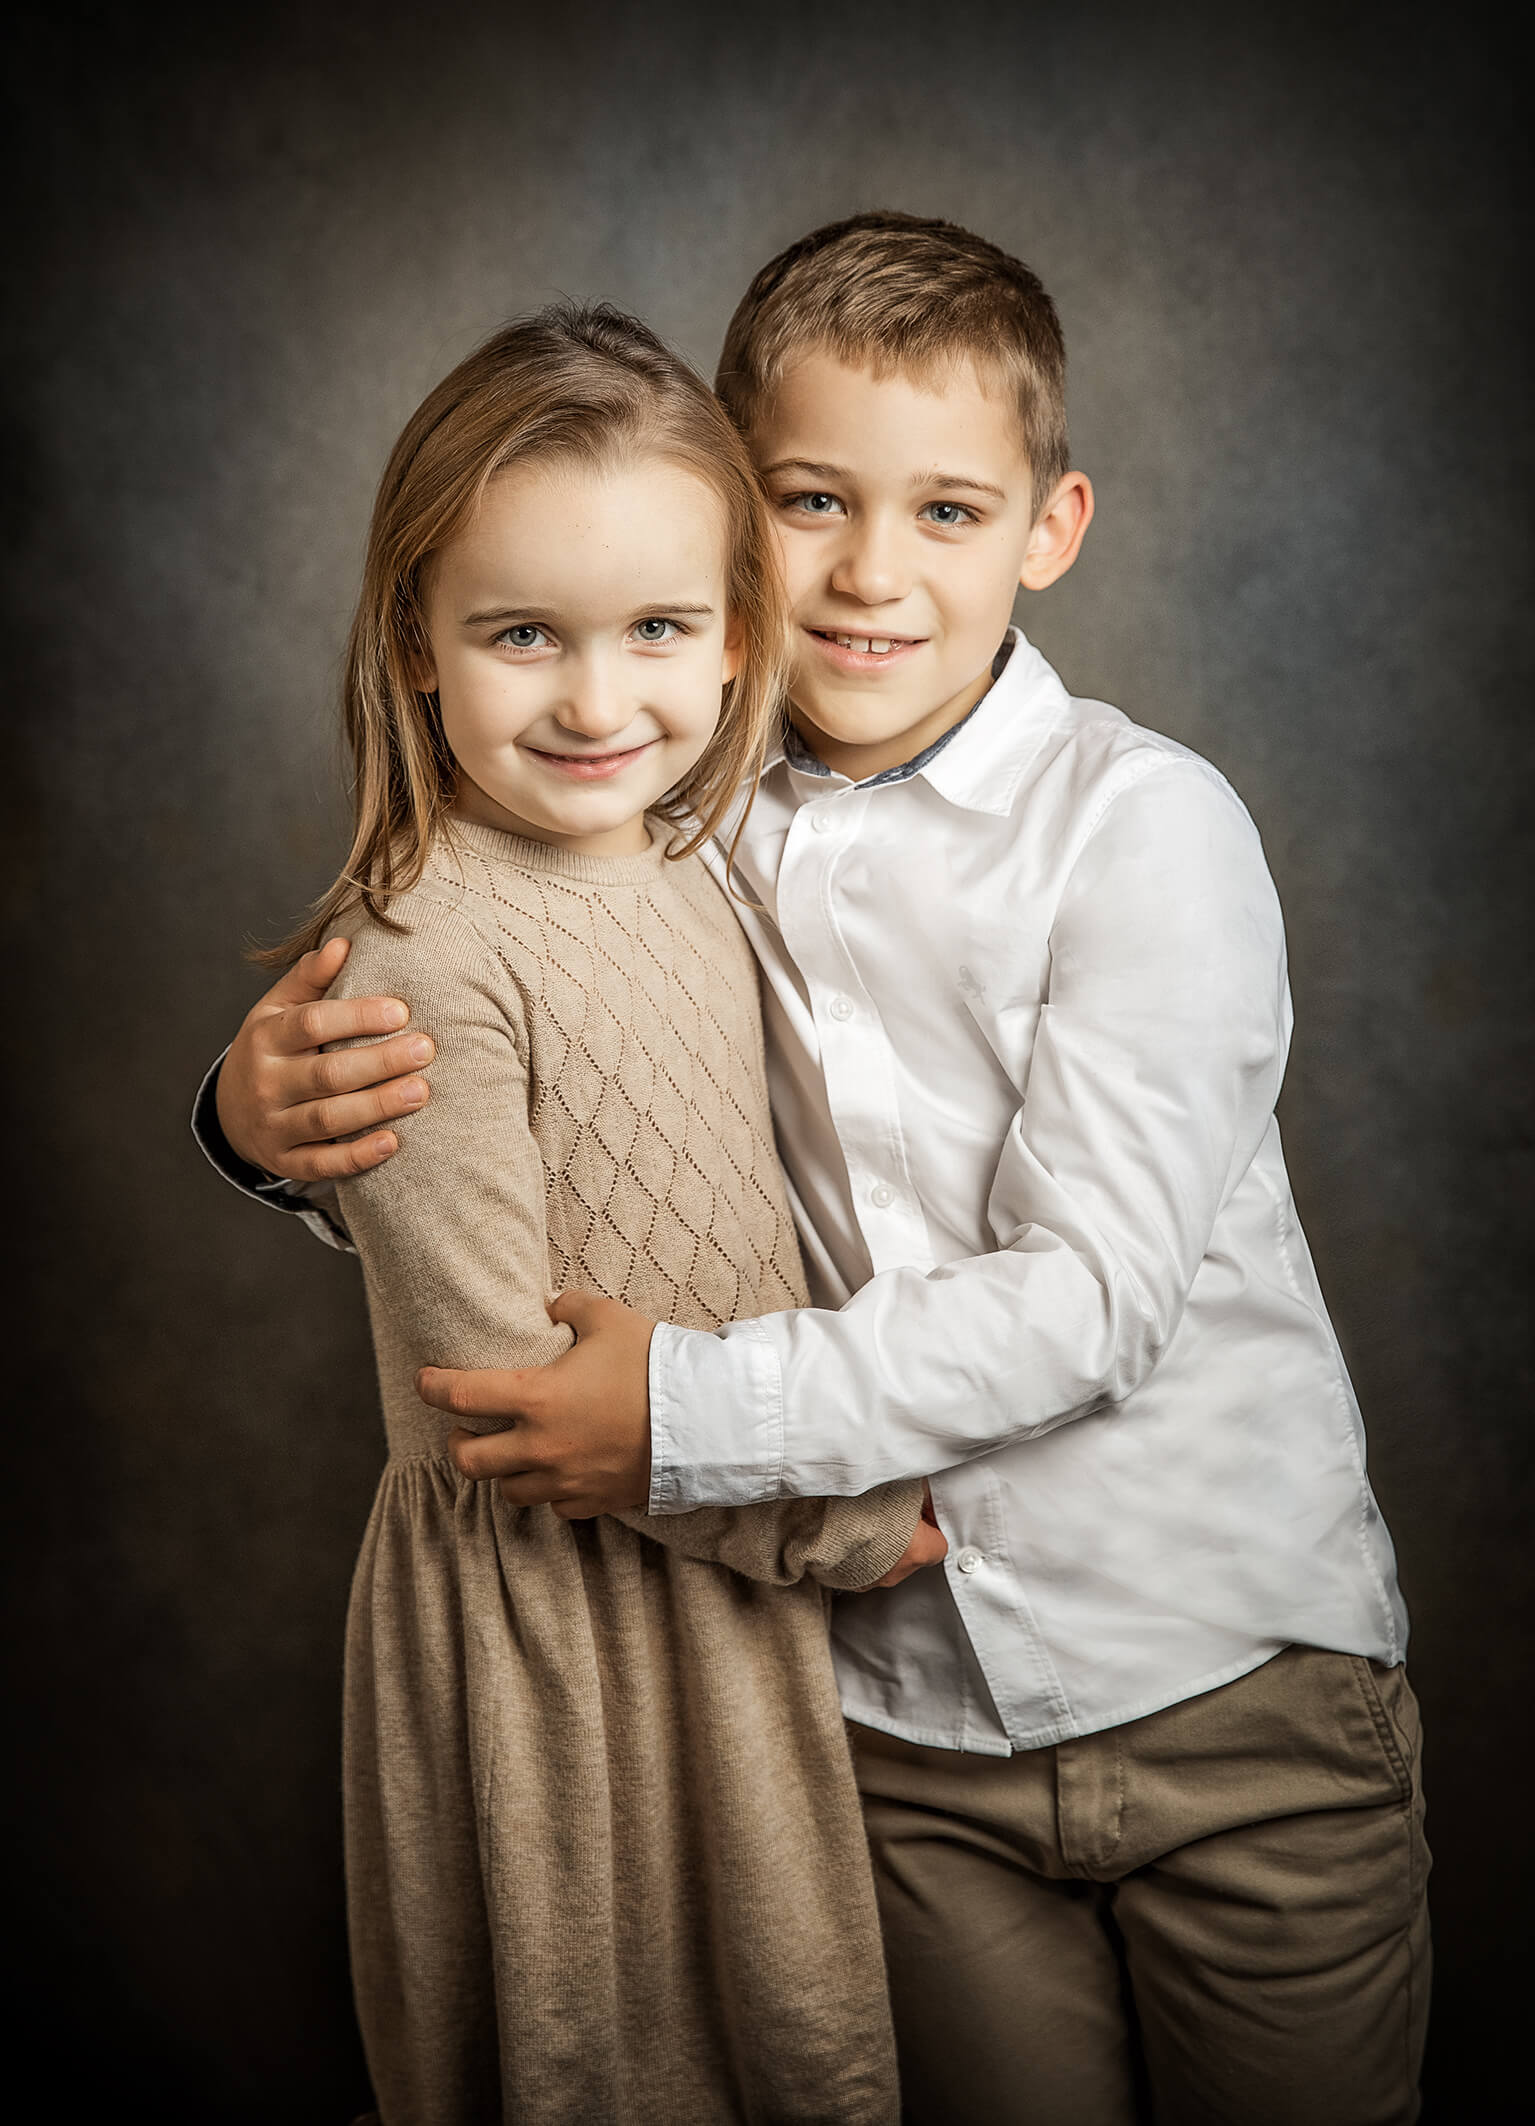 Fotostudio Lichtblick in Pegnitz Geschwisterliebe